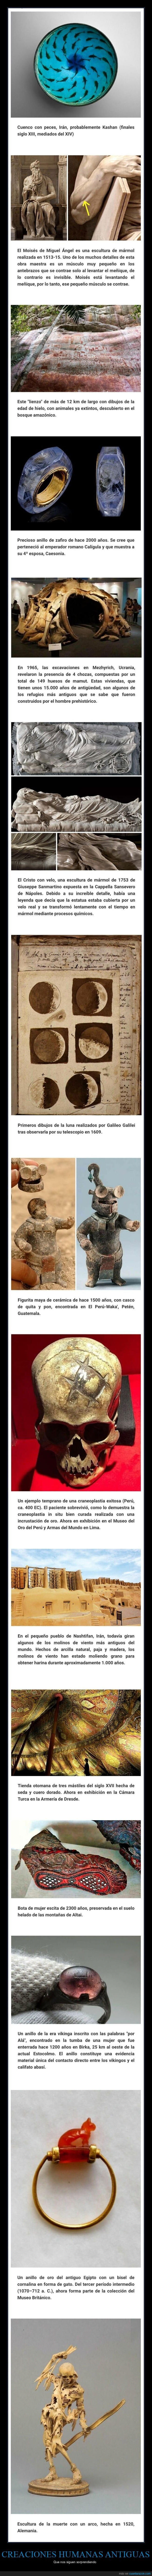 antiguas,creaciones humanas,curiosidades